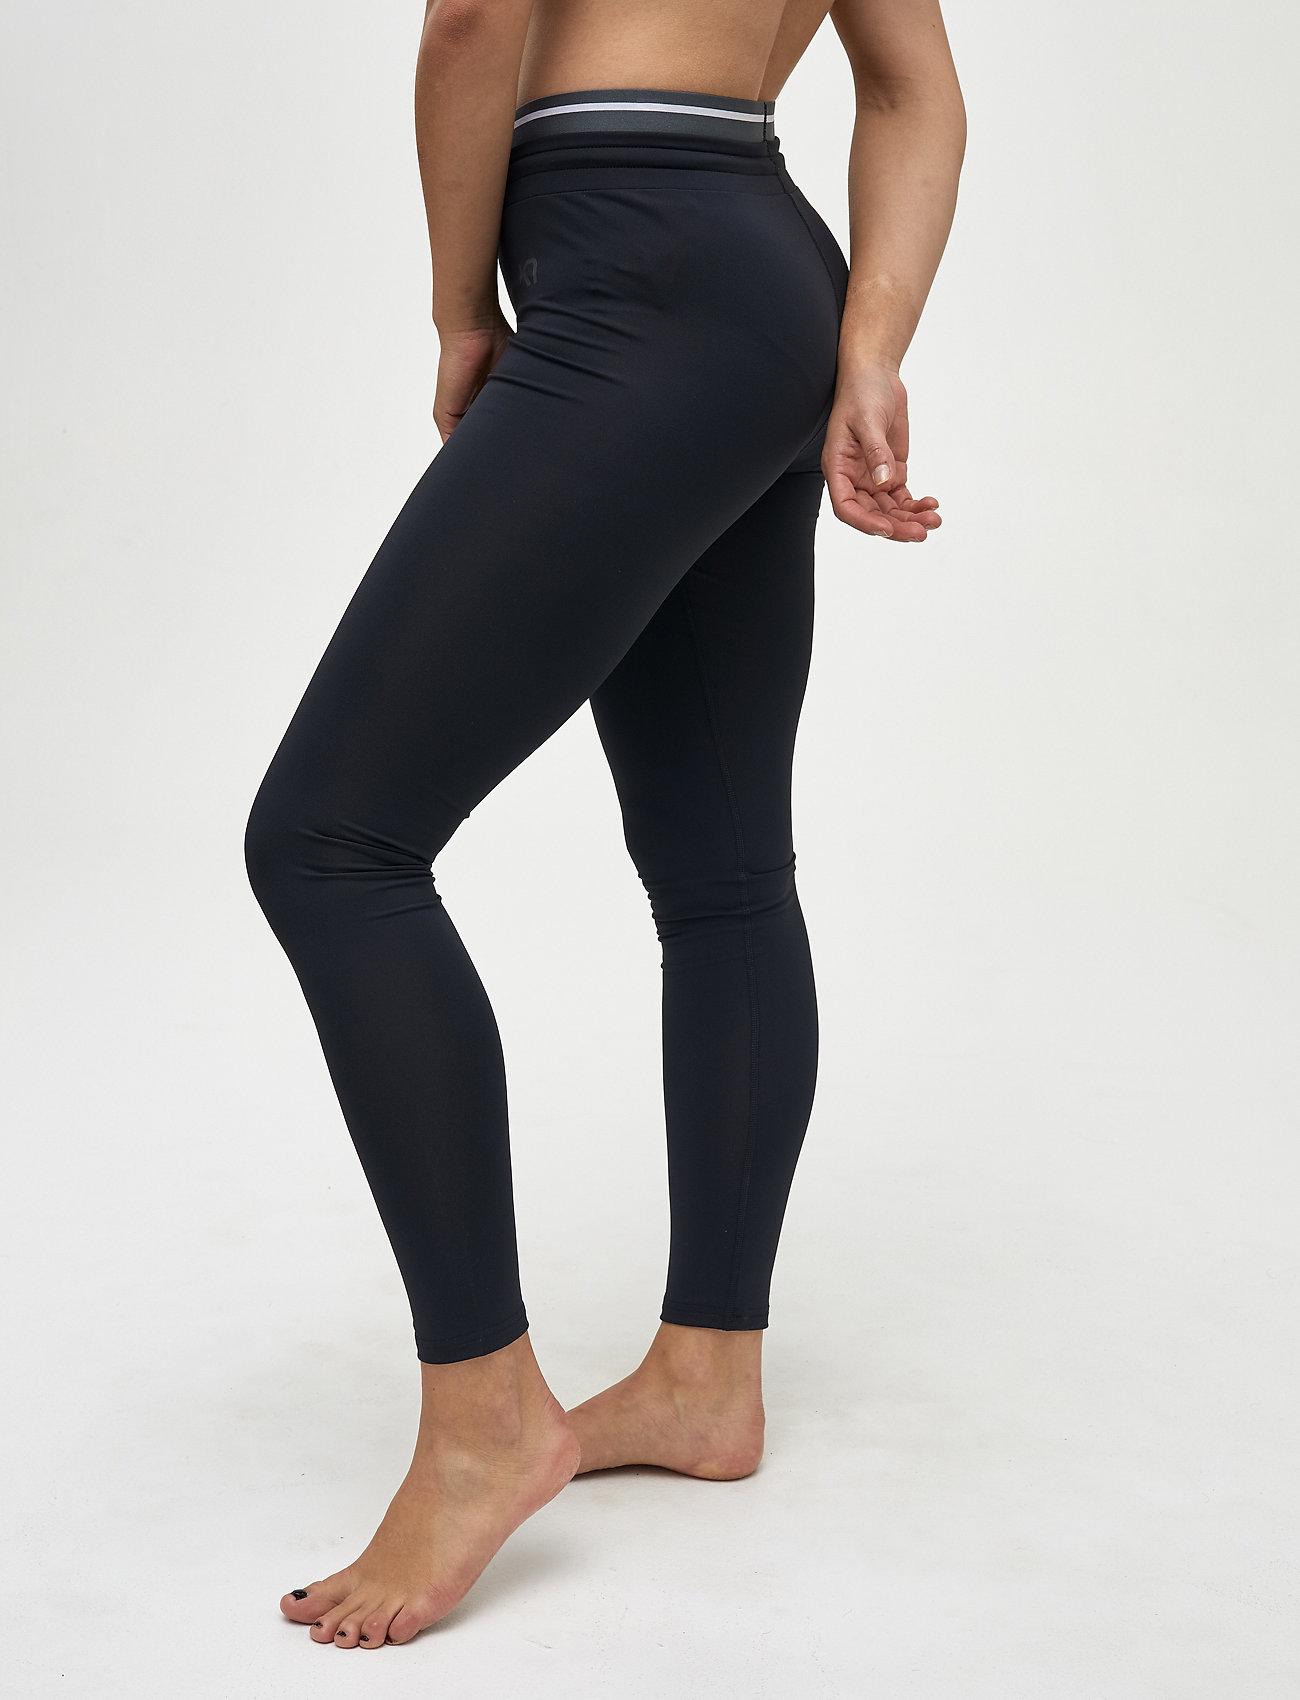 Kari Traa MIA TIGHTS - Leggings & tights BLACK - Dameklær Spesialtilbud